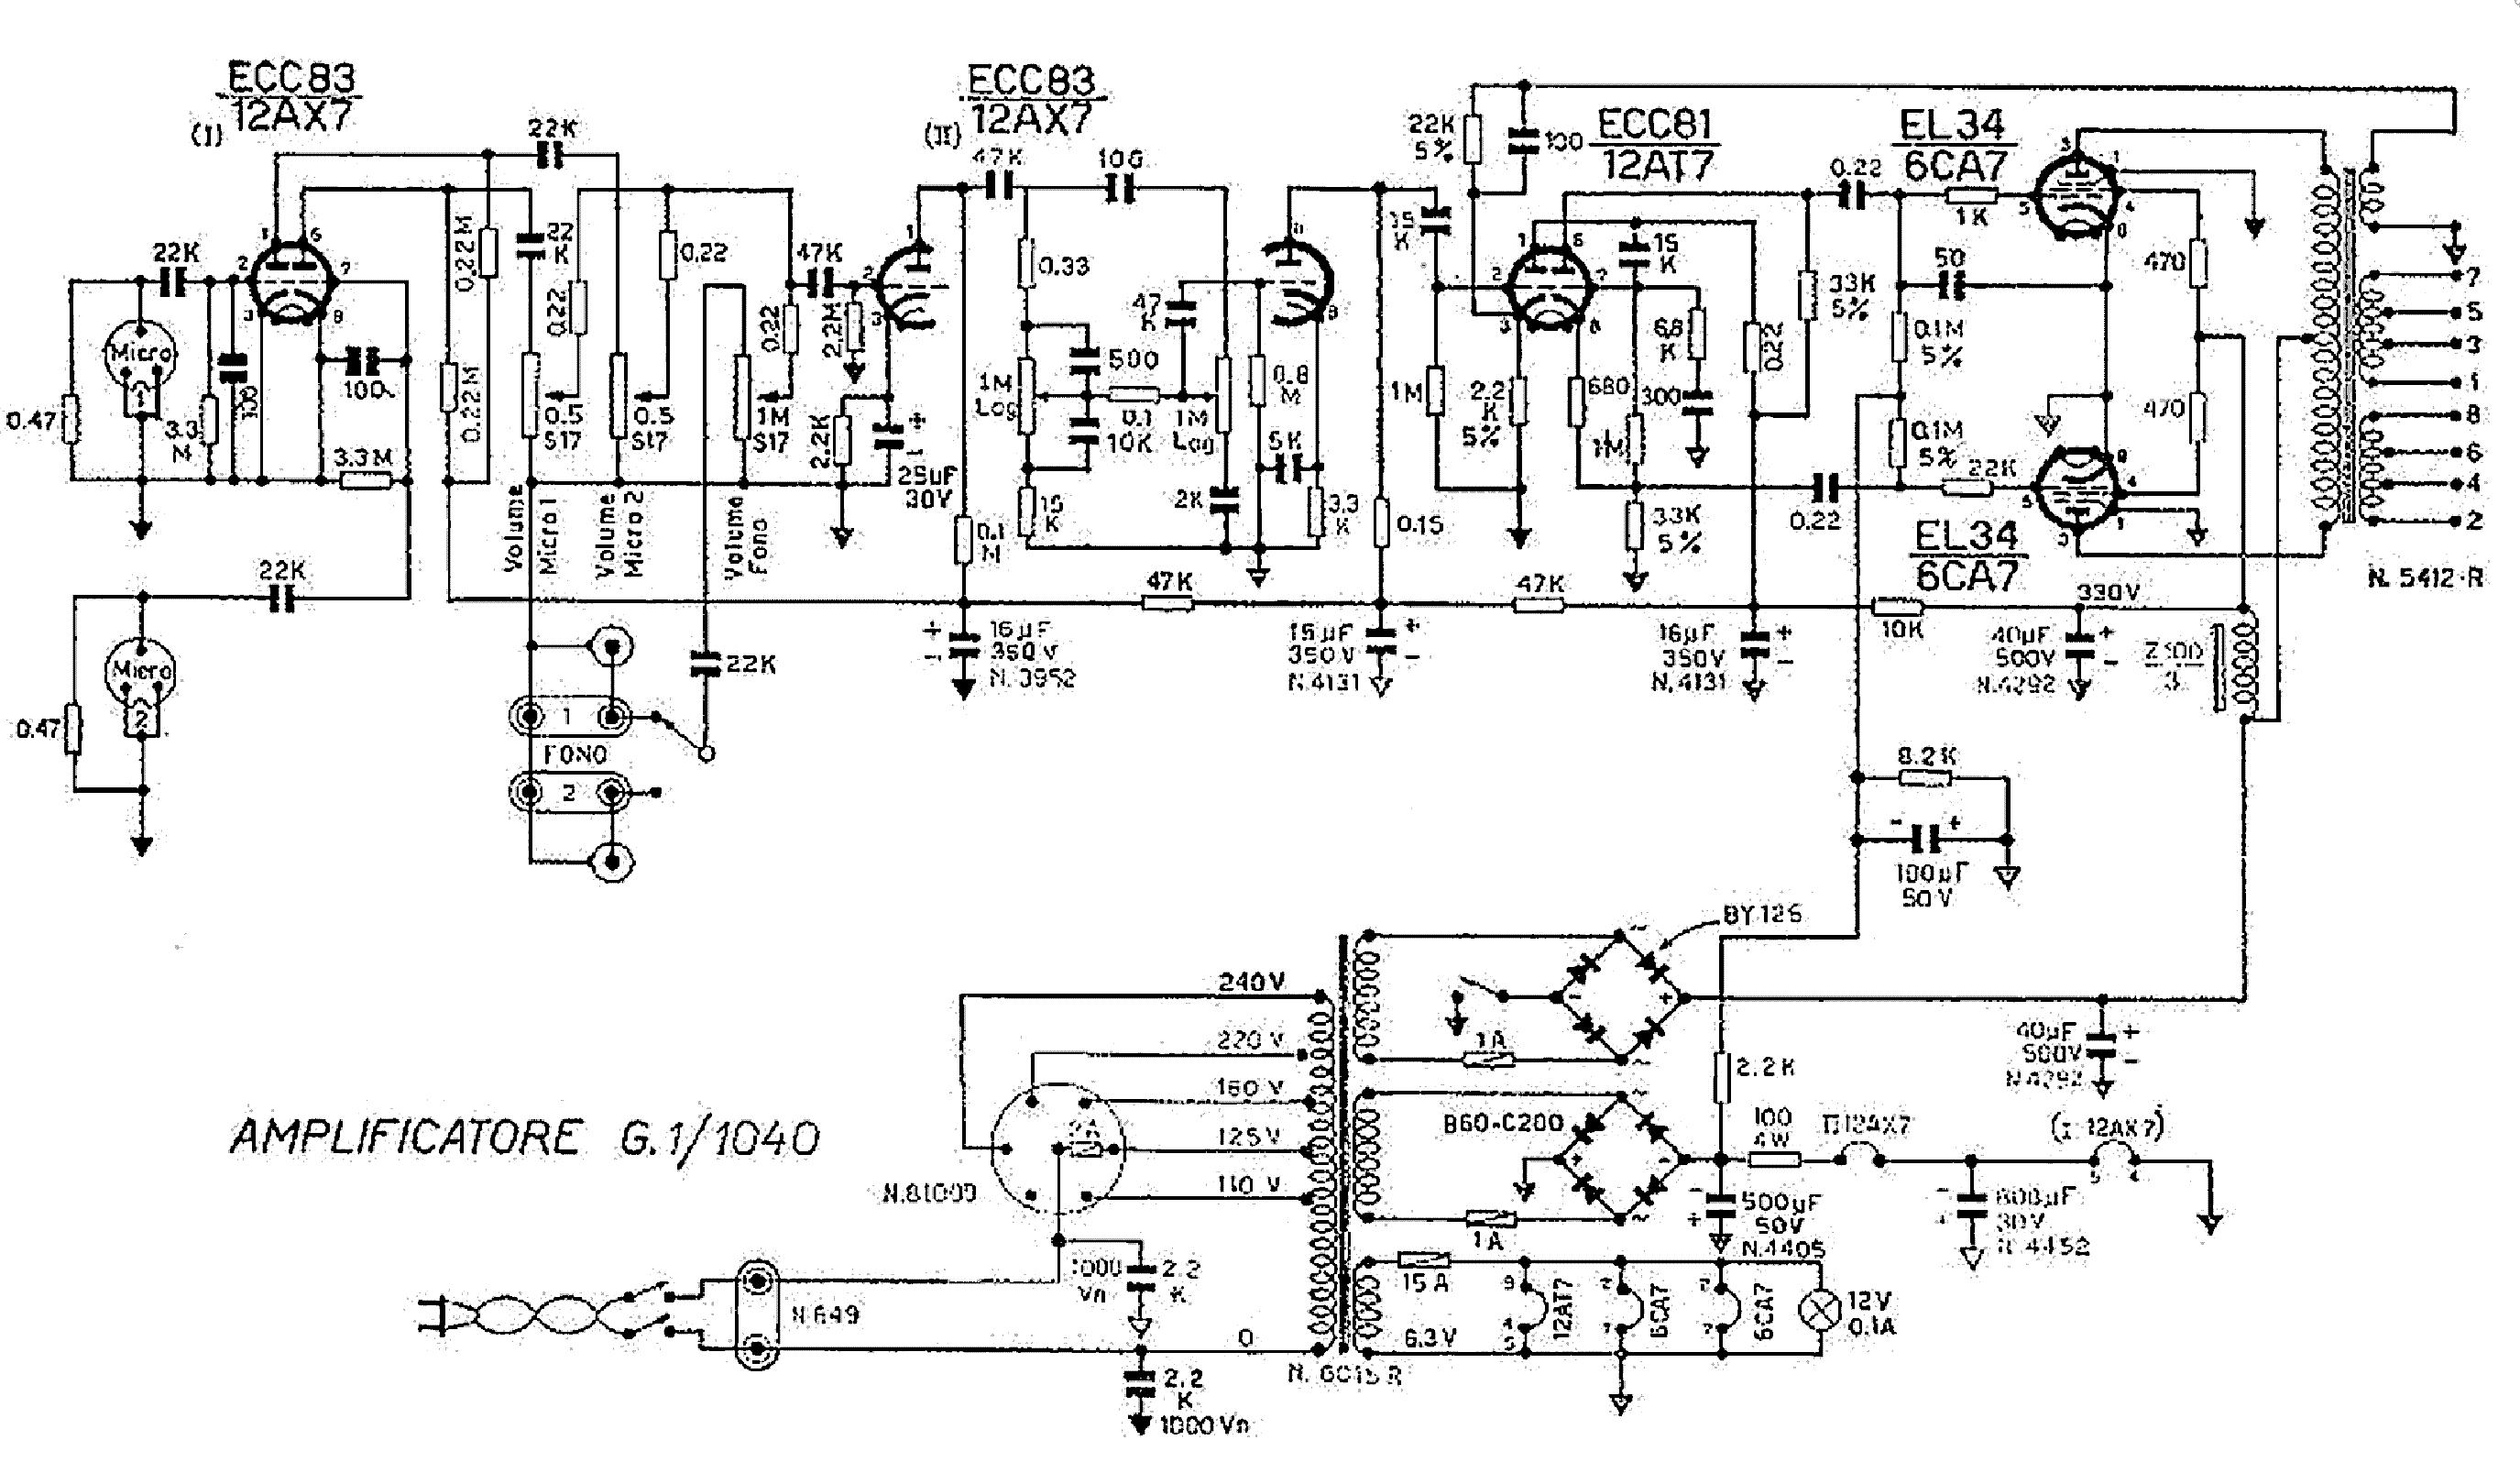 repair manual downloads 1994 f350 diesel. Black Bedroom Furniture Sets. Home Design Ideas